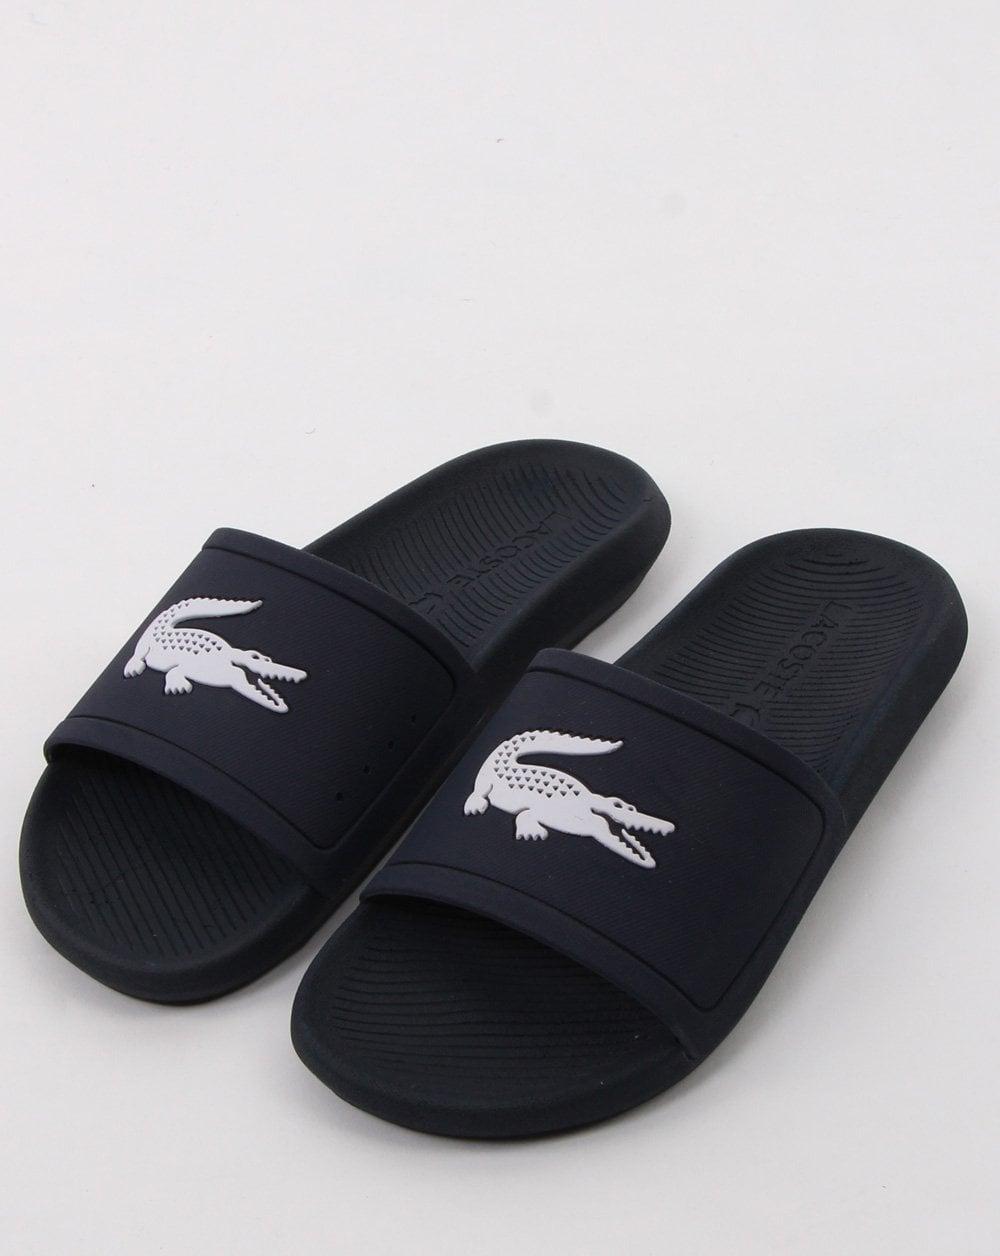 5c14072bbdf3 Lacoste Lacoste Footwear Croco Slide Navy white